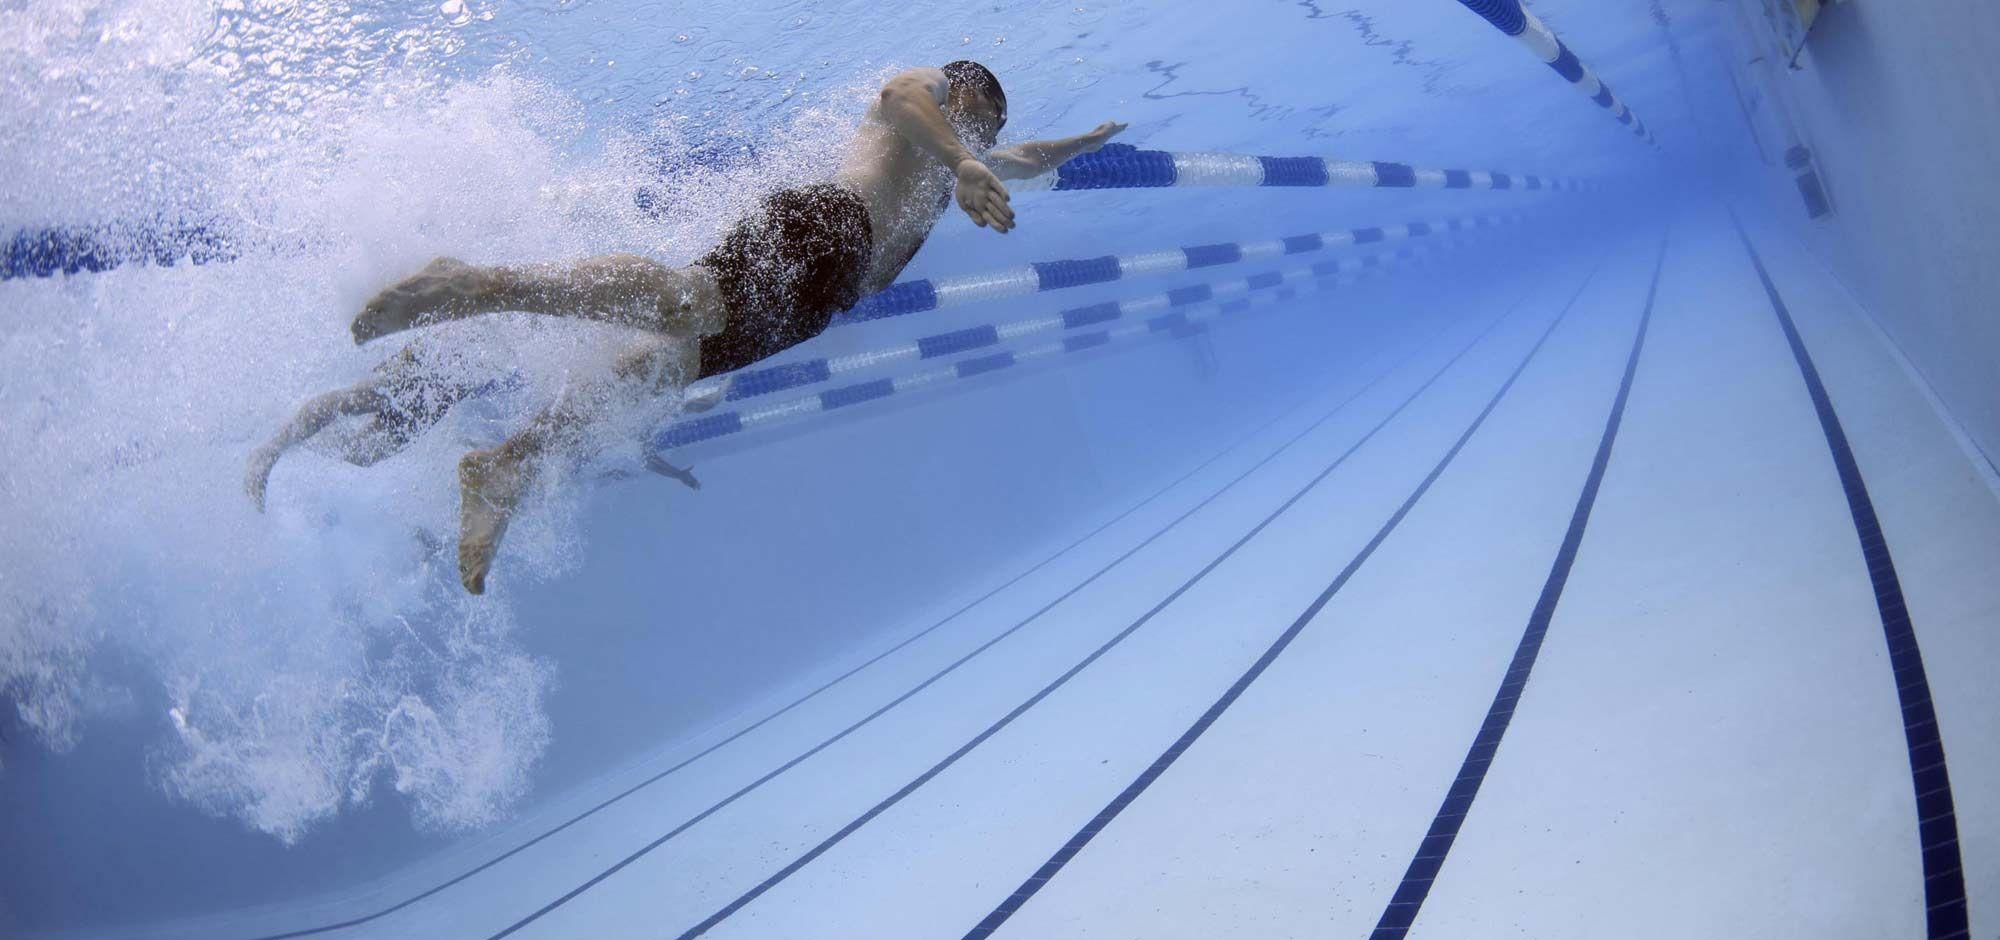 it:Nuotare|fr:Nager|en:Schwimmen|de:Schwimmen